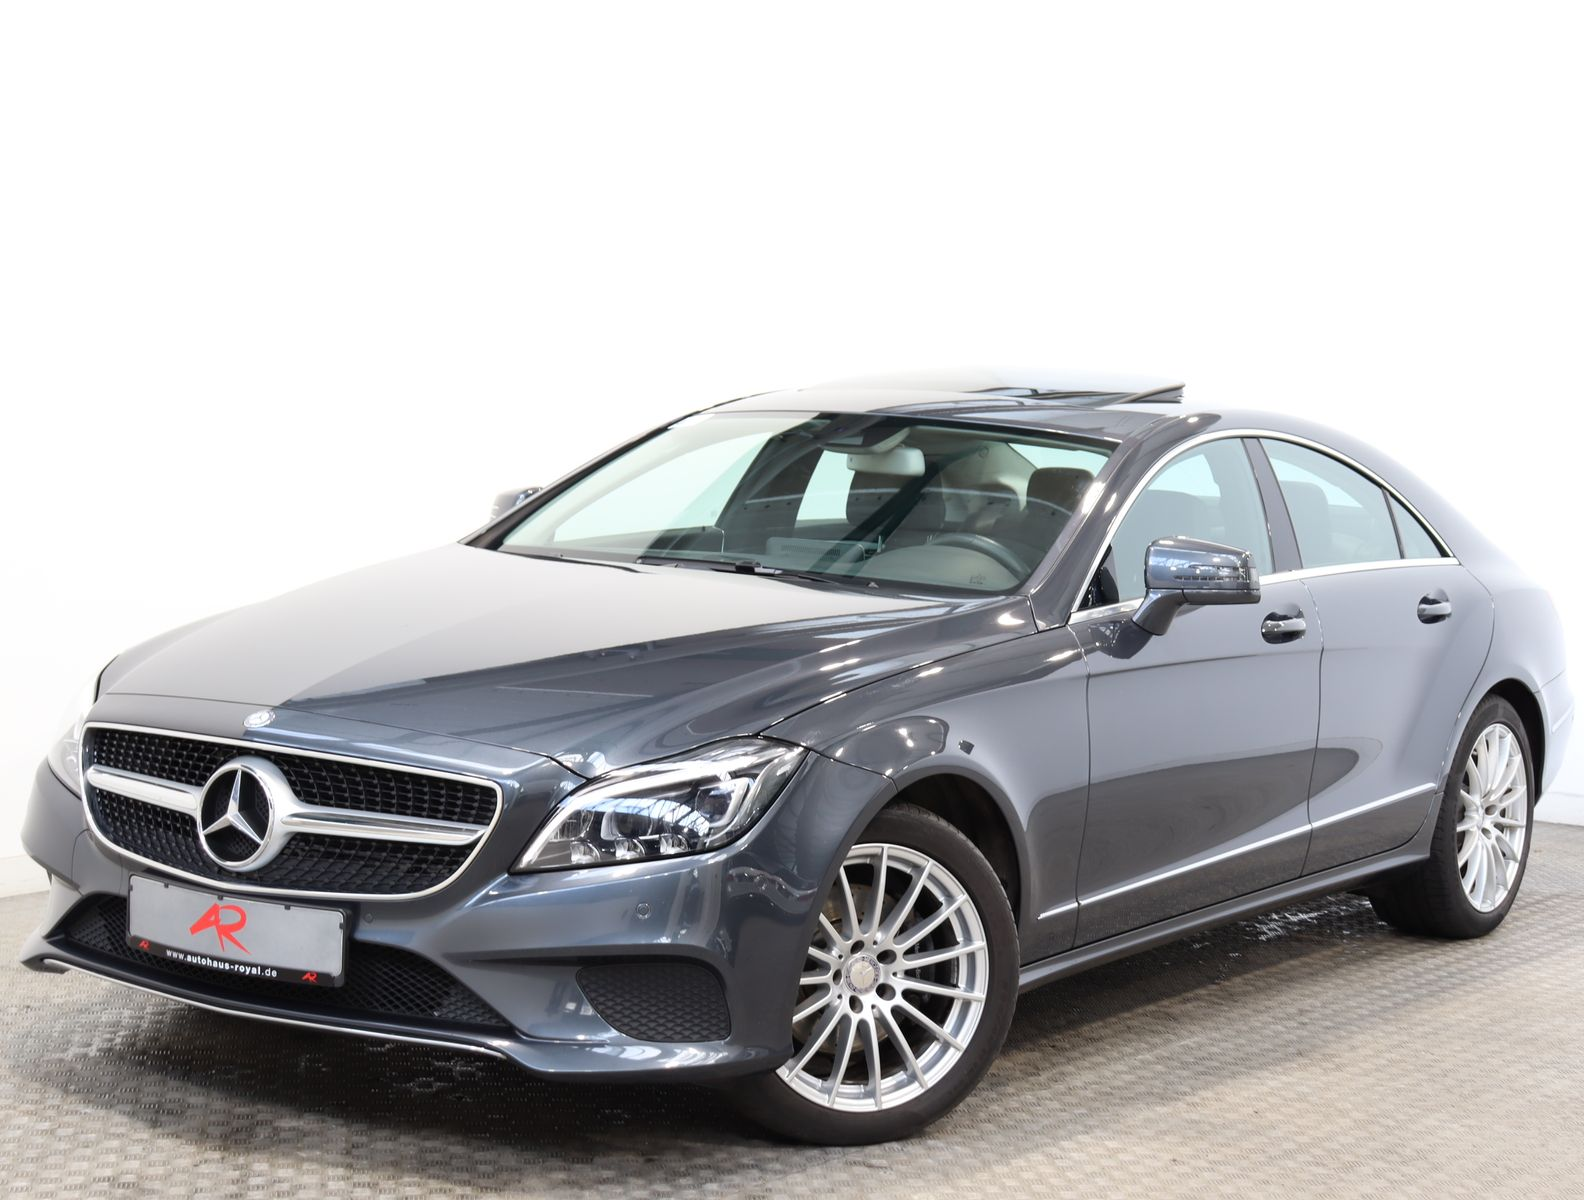 Mercedes-Benz CLS 350 CDI Coupe 4M EXCLUSIV,AIRMATIC,MULTIBEAM, Jahr 2014, Diesel